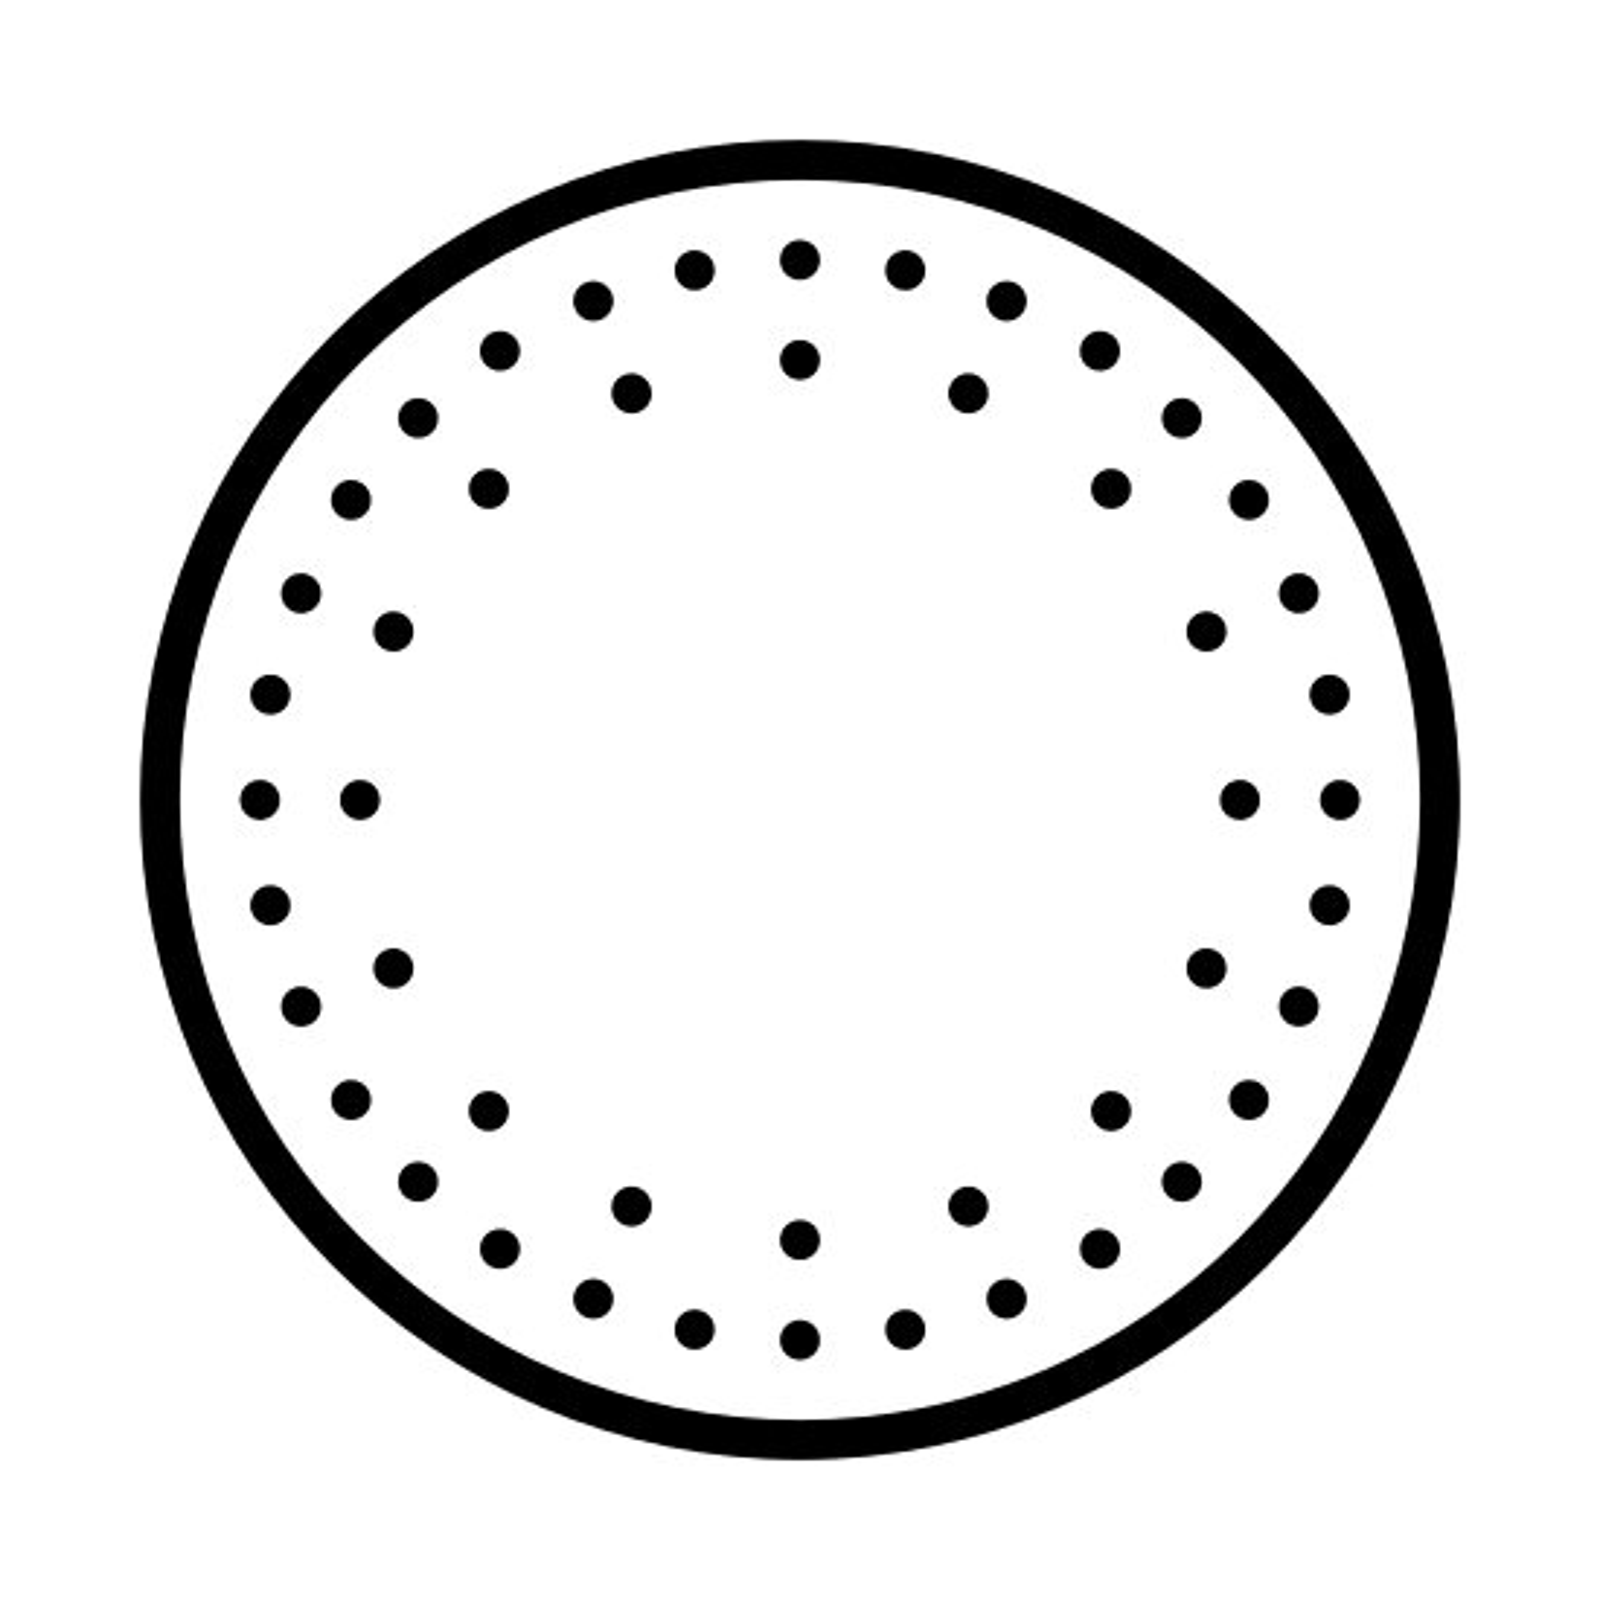 kropka icon